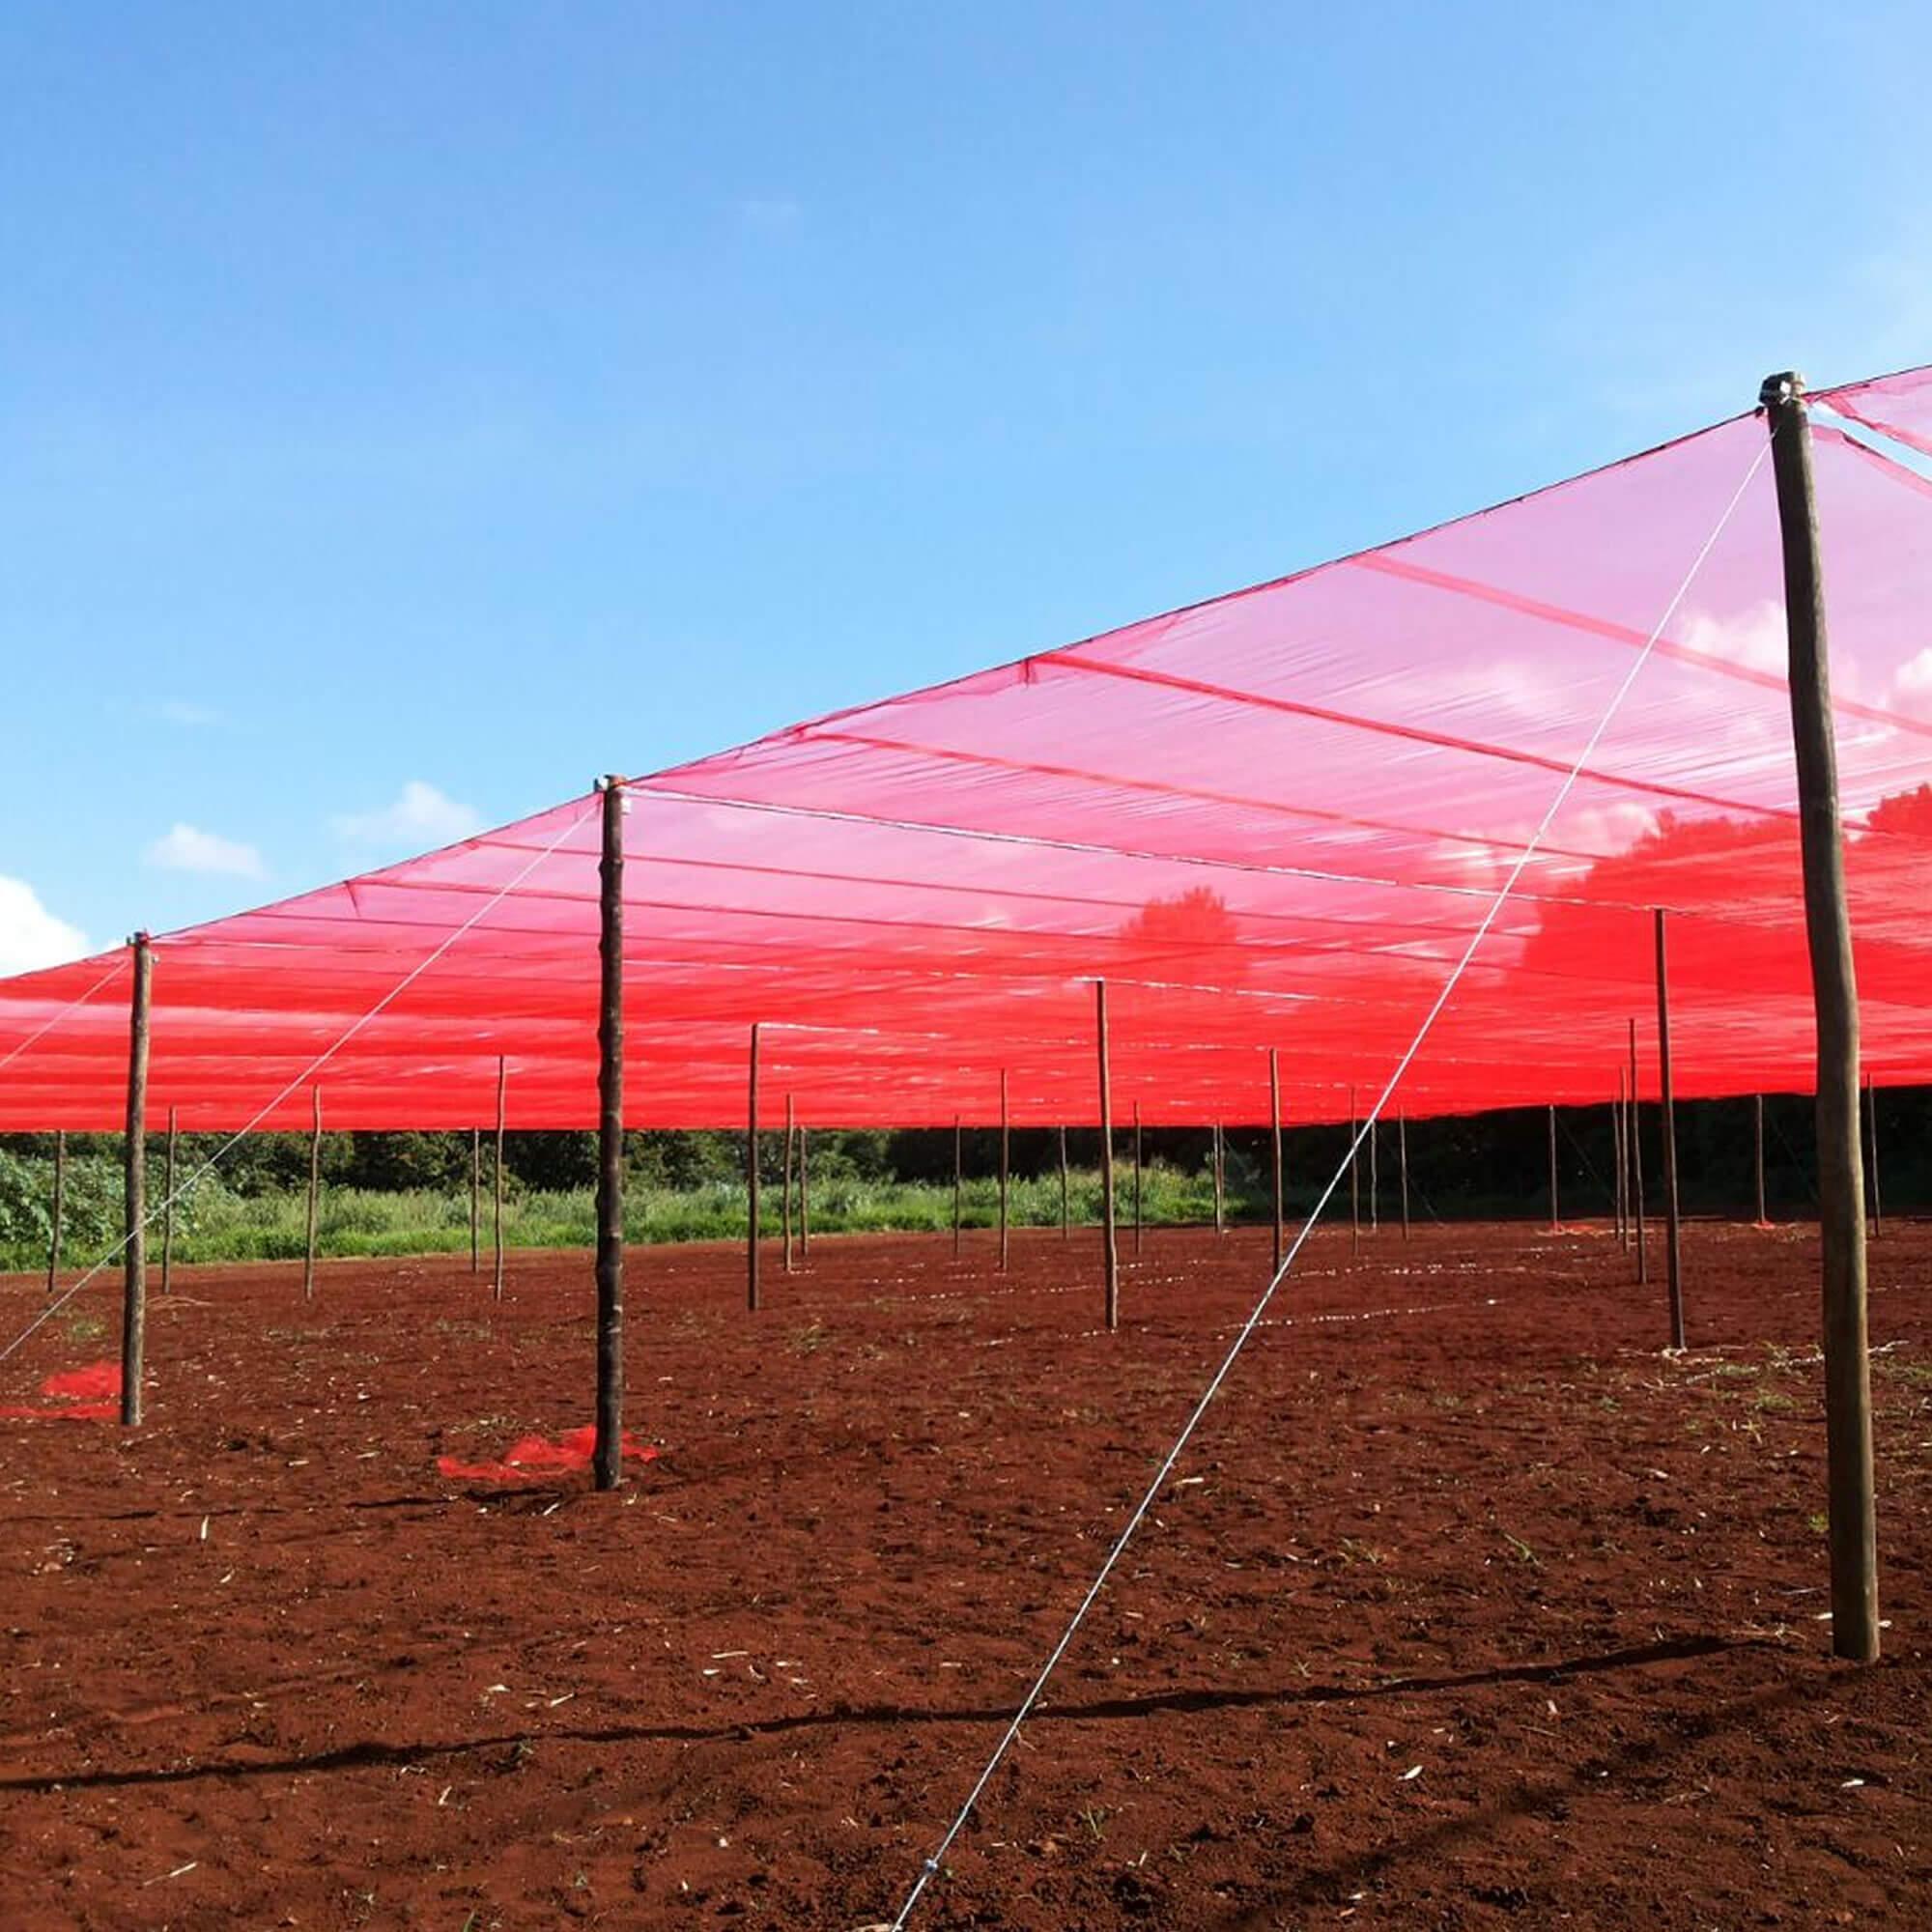 Tela de Sombreamento Vermelha 20% - 4,15 x 30 metros